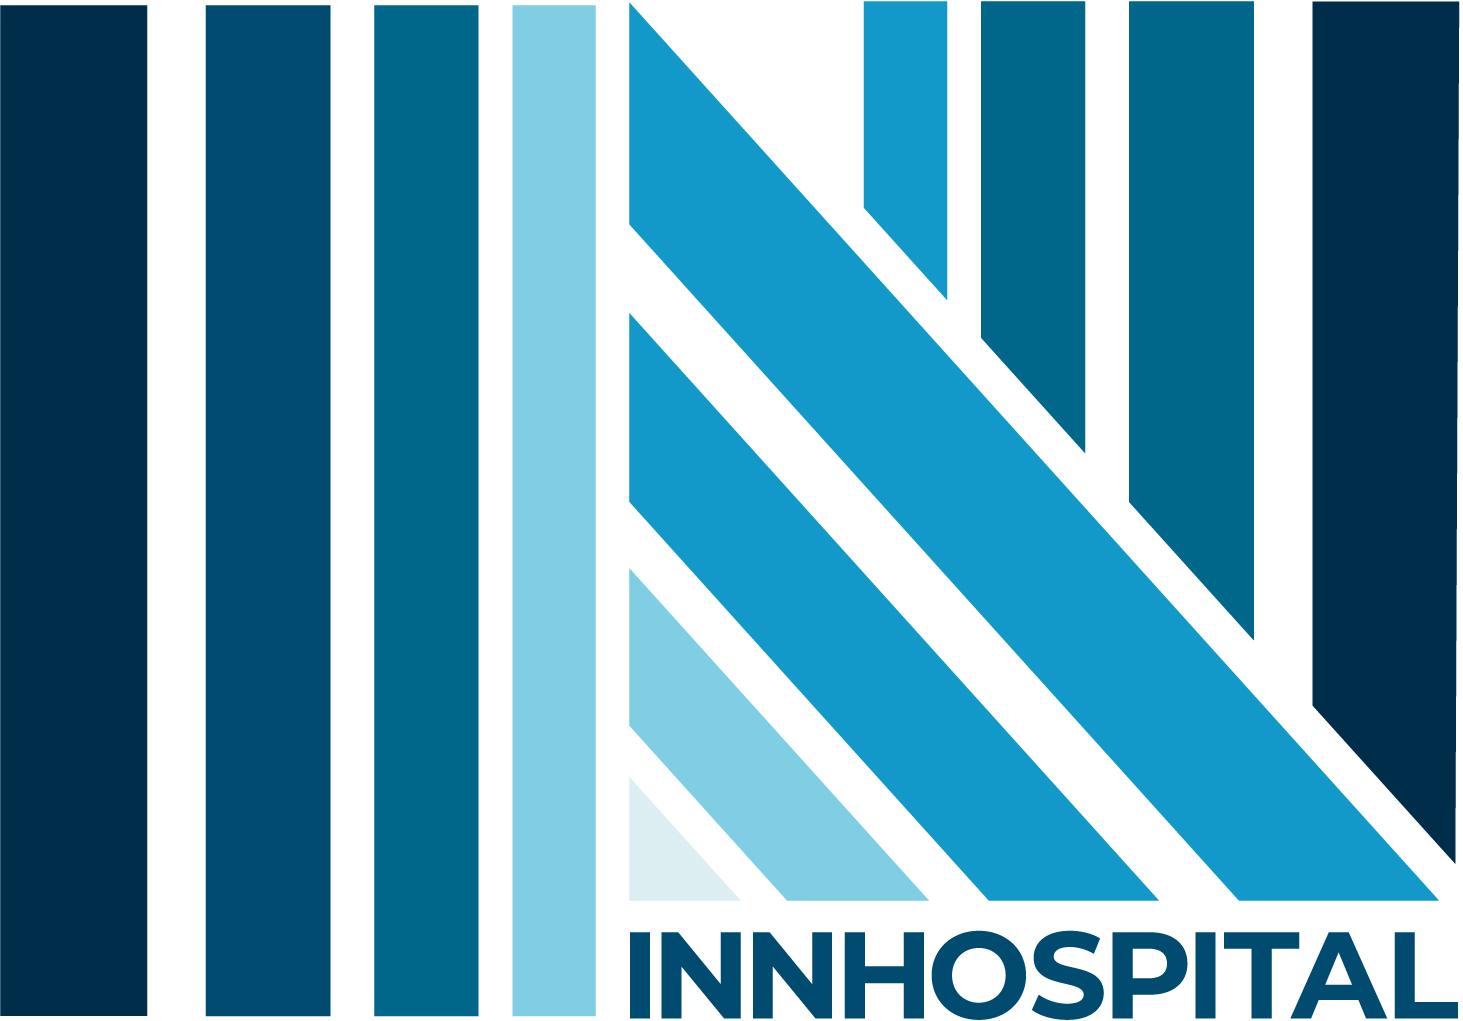 INNHospital